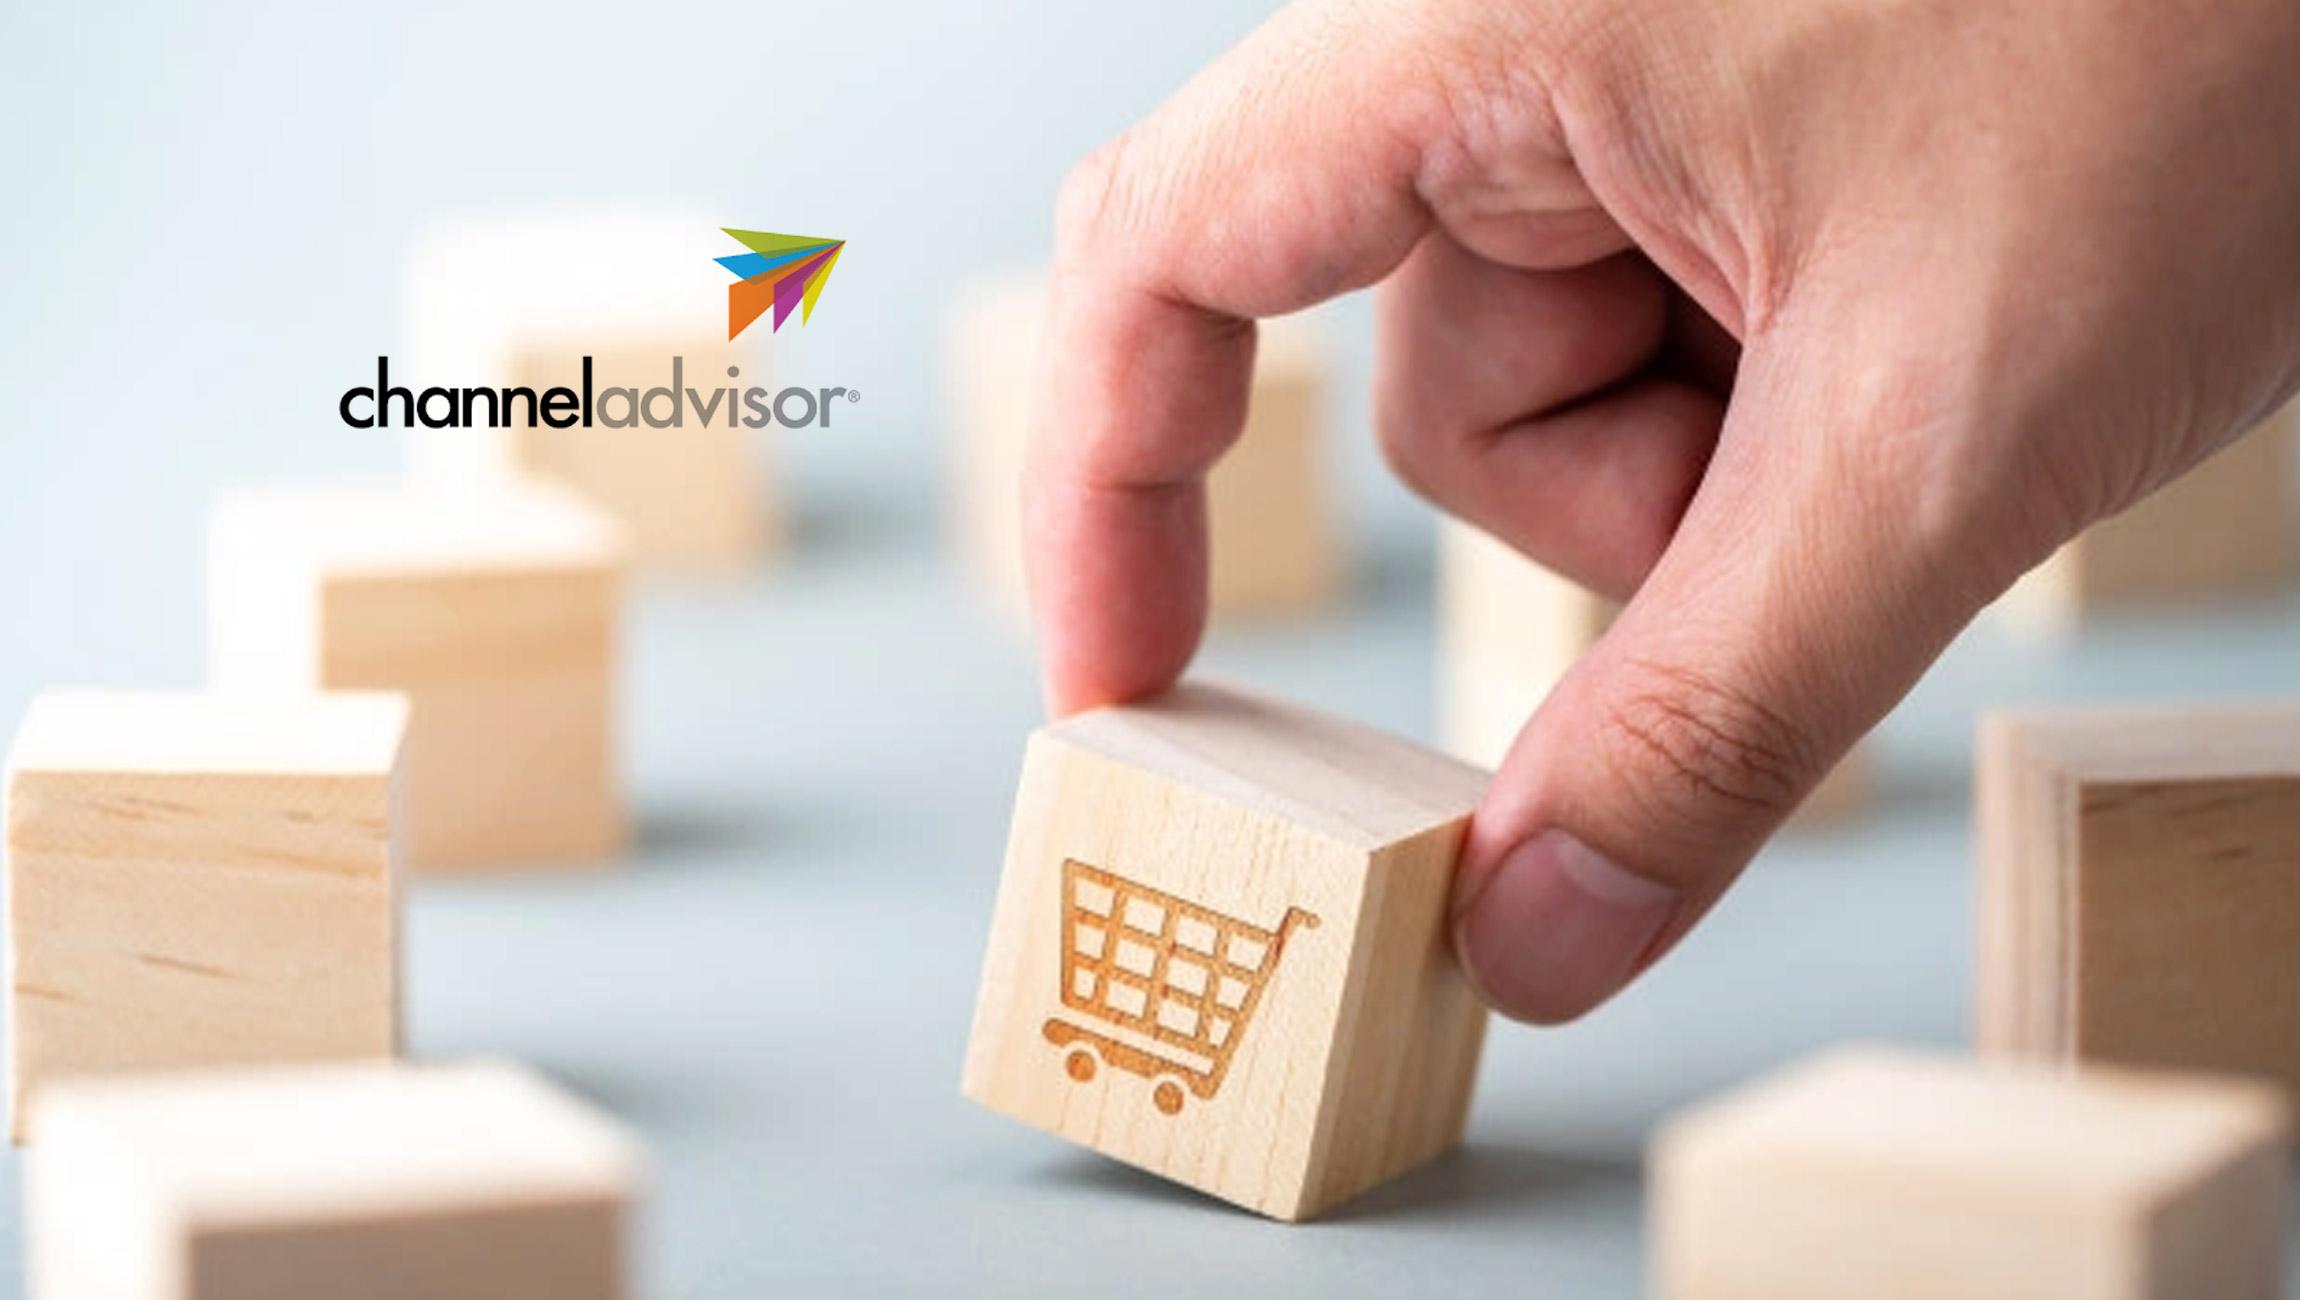 ChannelAdvisor Announces 2021 E-Commerce Consumer Survey Results